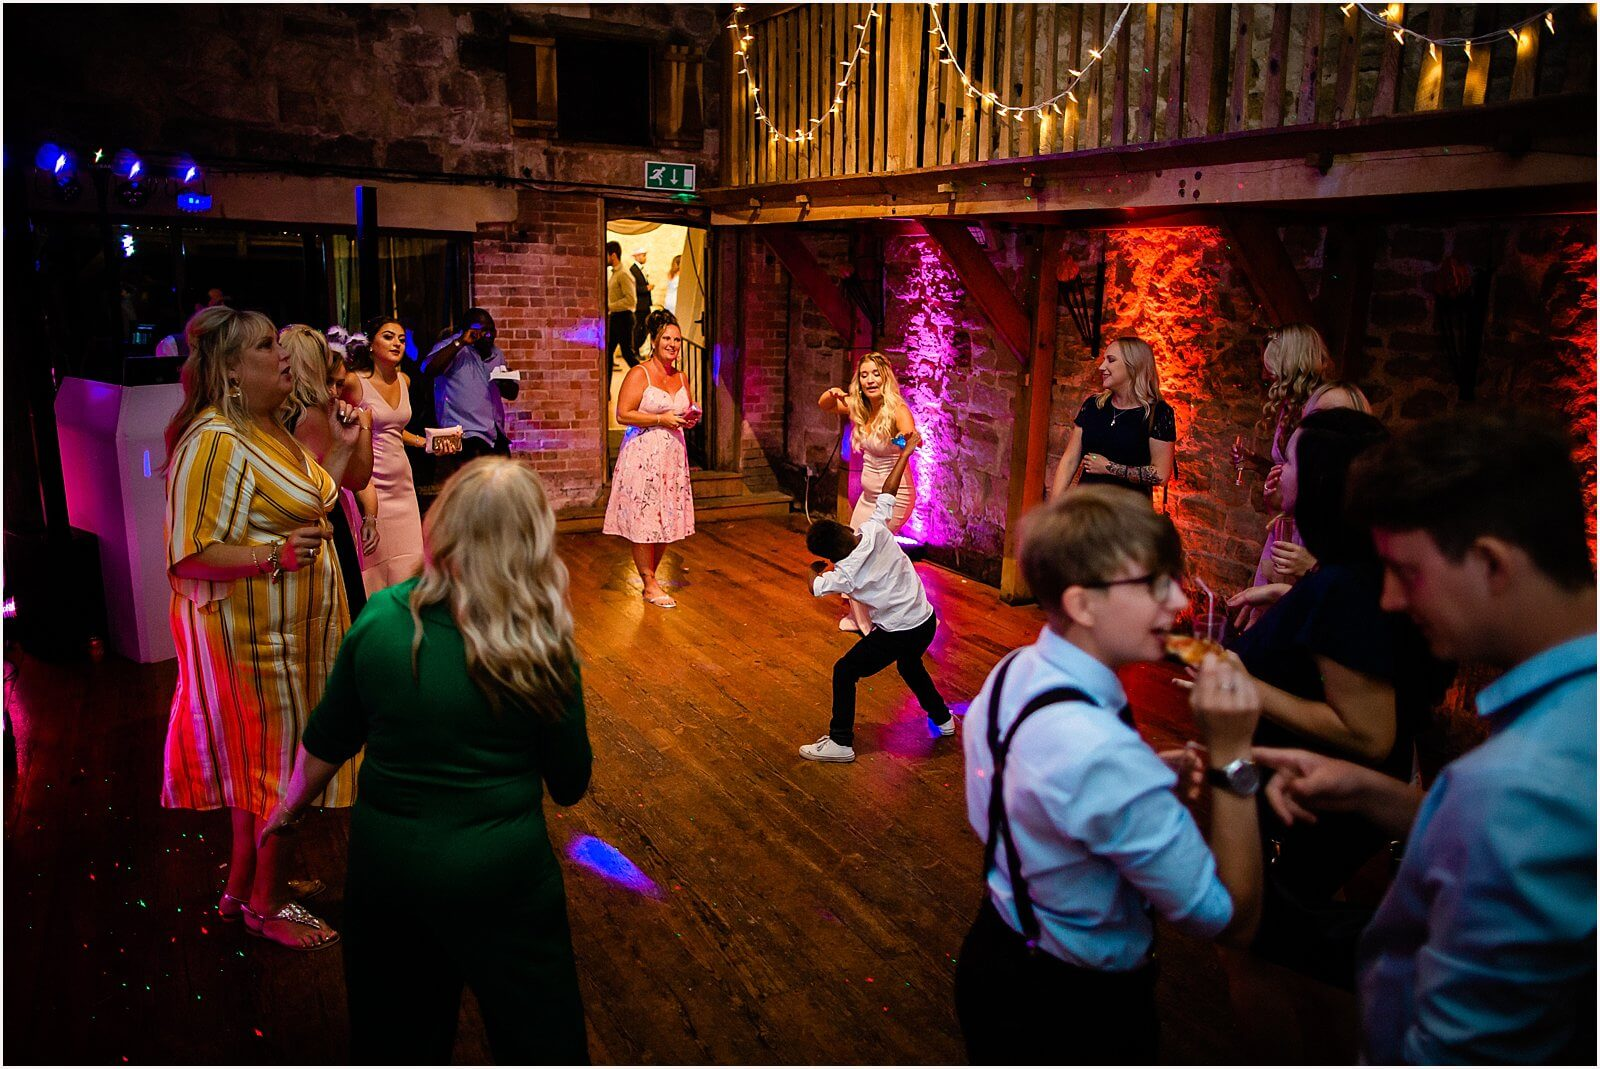 Swallows Oast Wedding - Jakki + Luke's barn wedding photography 63